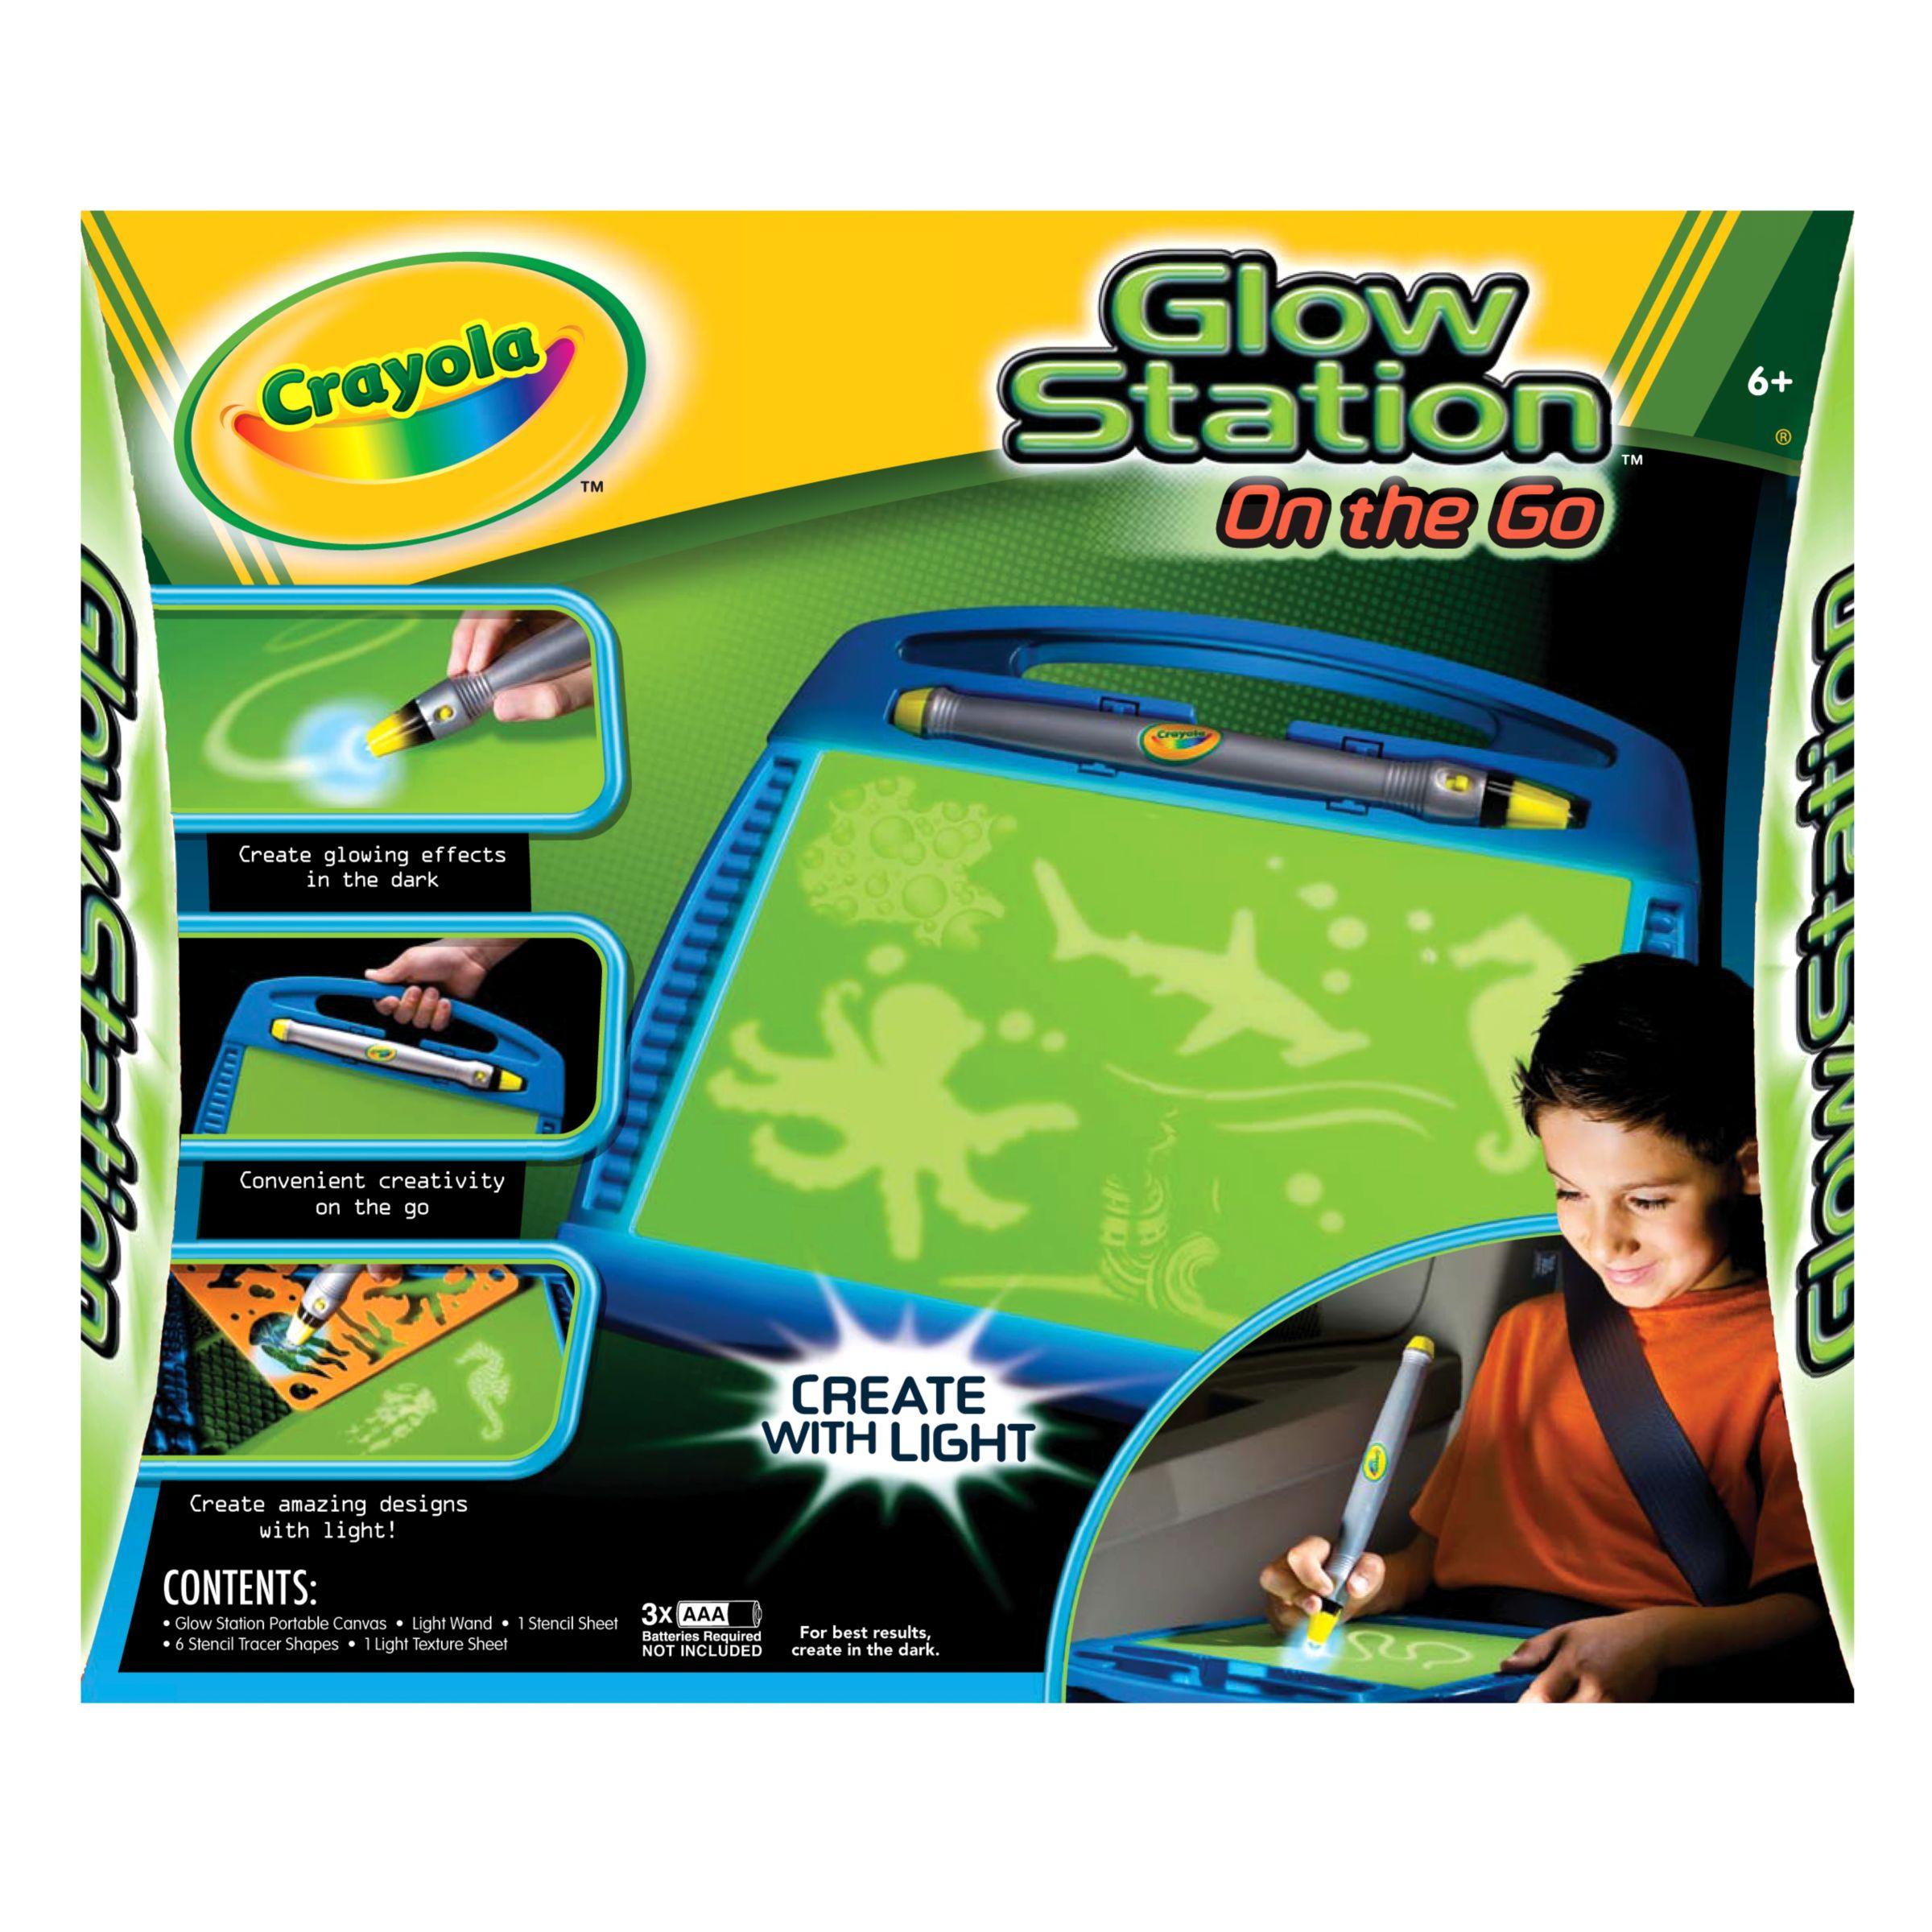 Crayola Glow Station On The Go